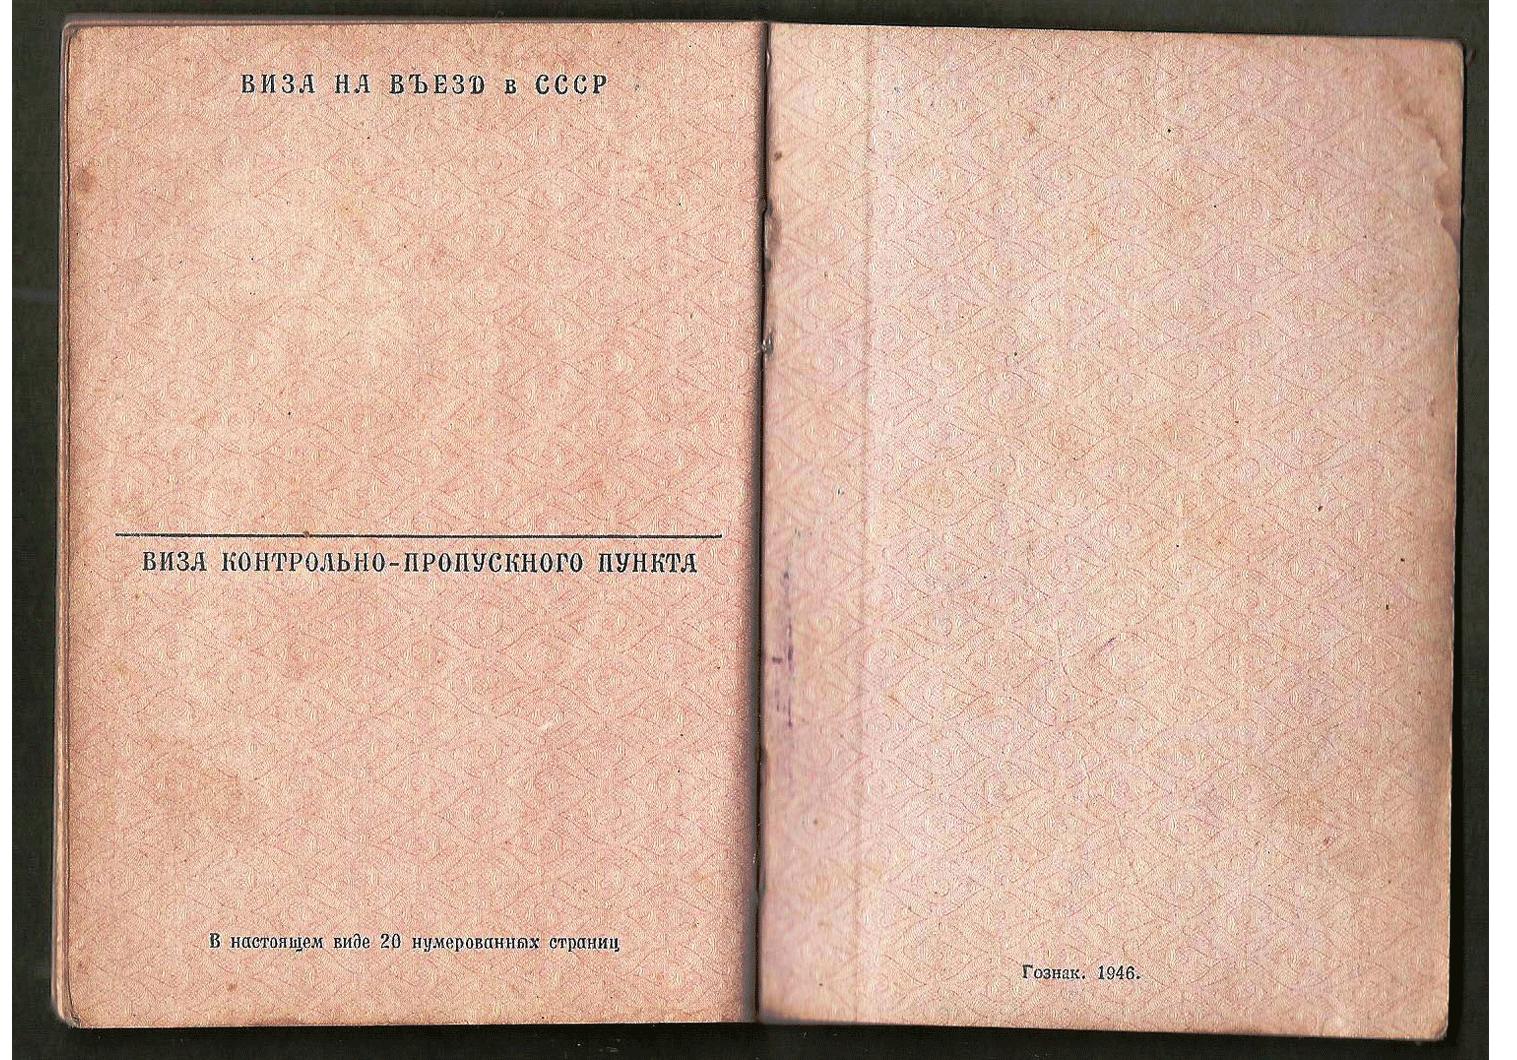 WW2 Soviet passport